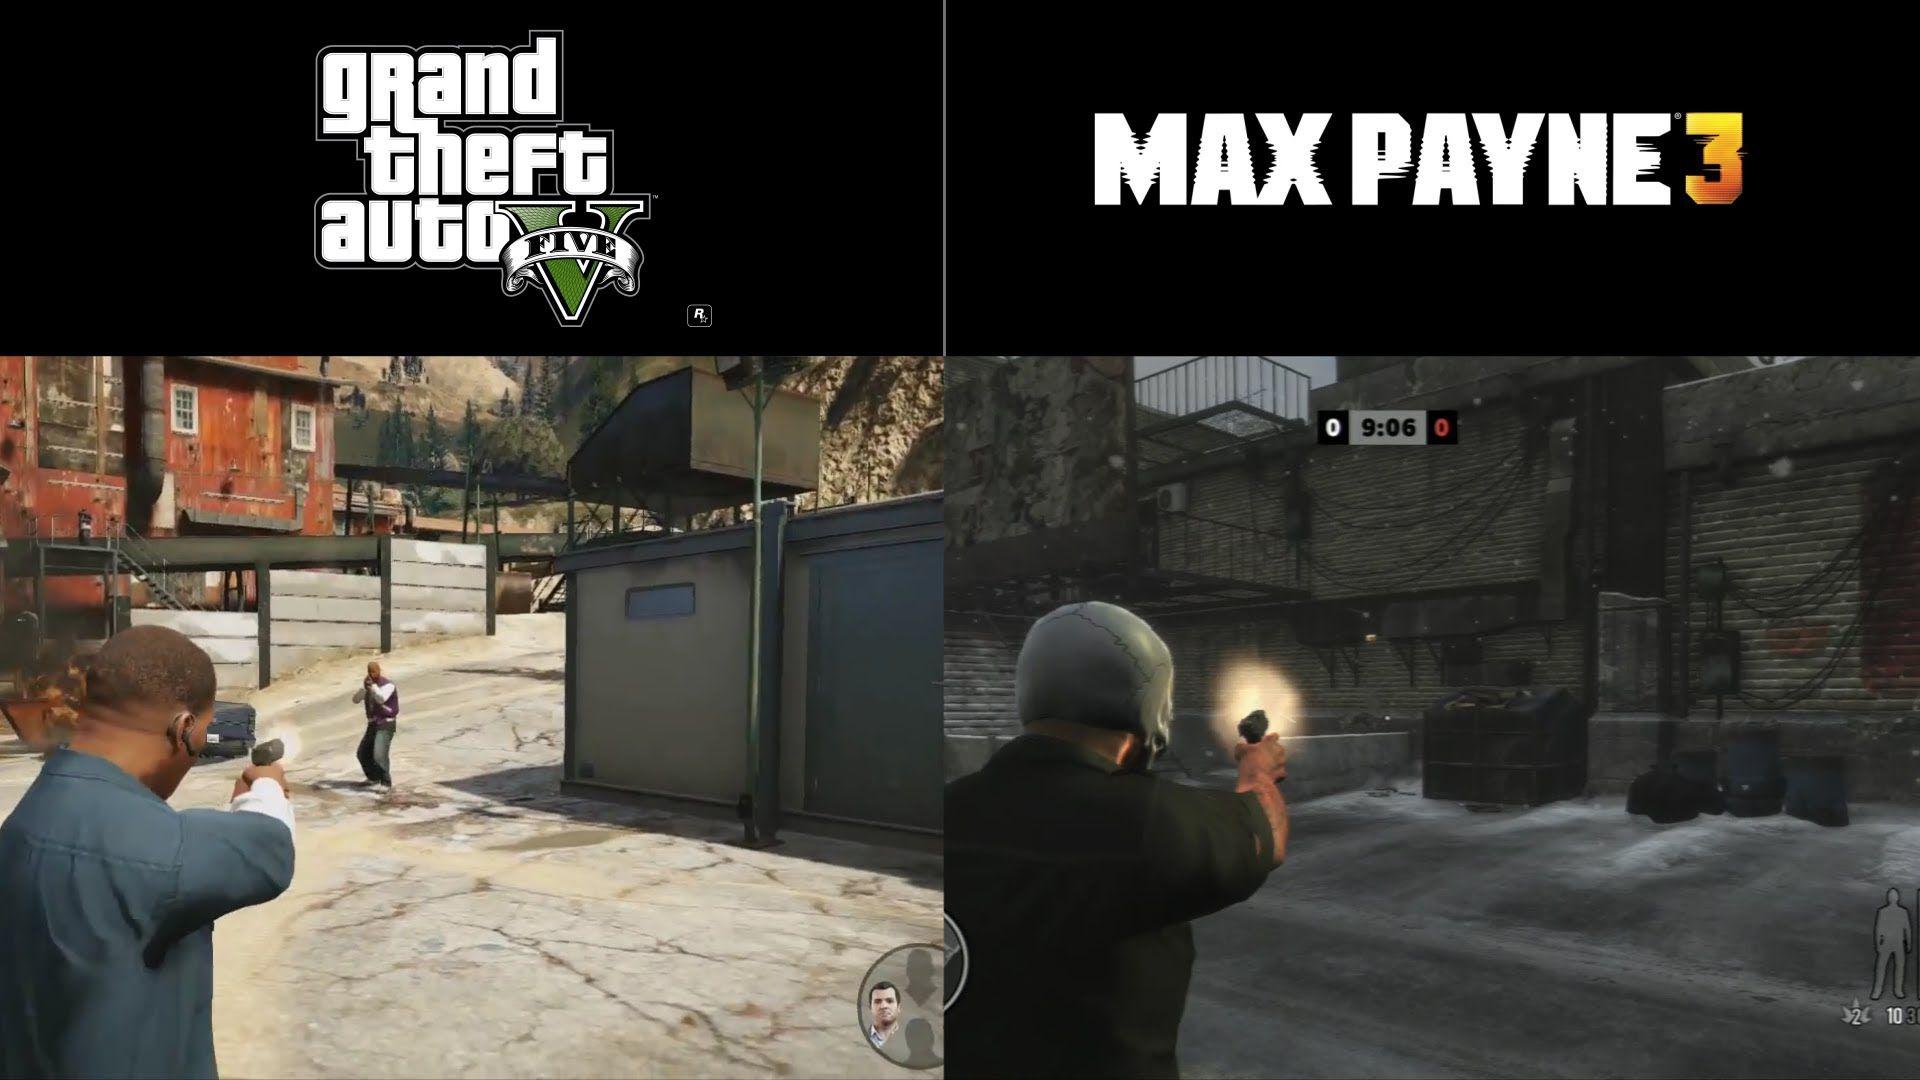 GTA 5 vs. Max Payne 3